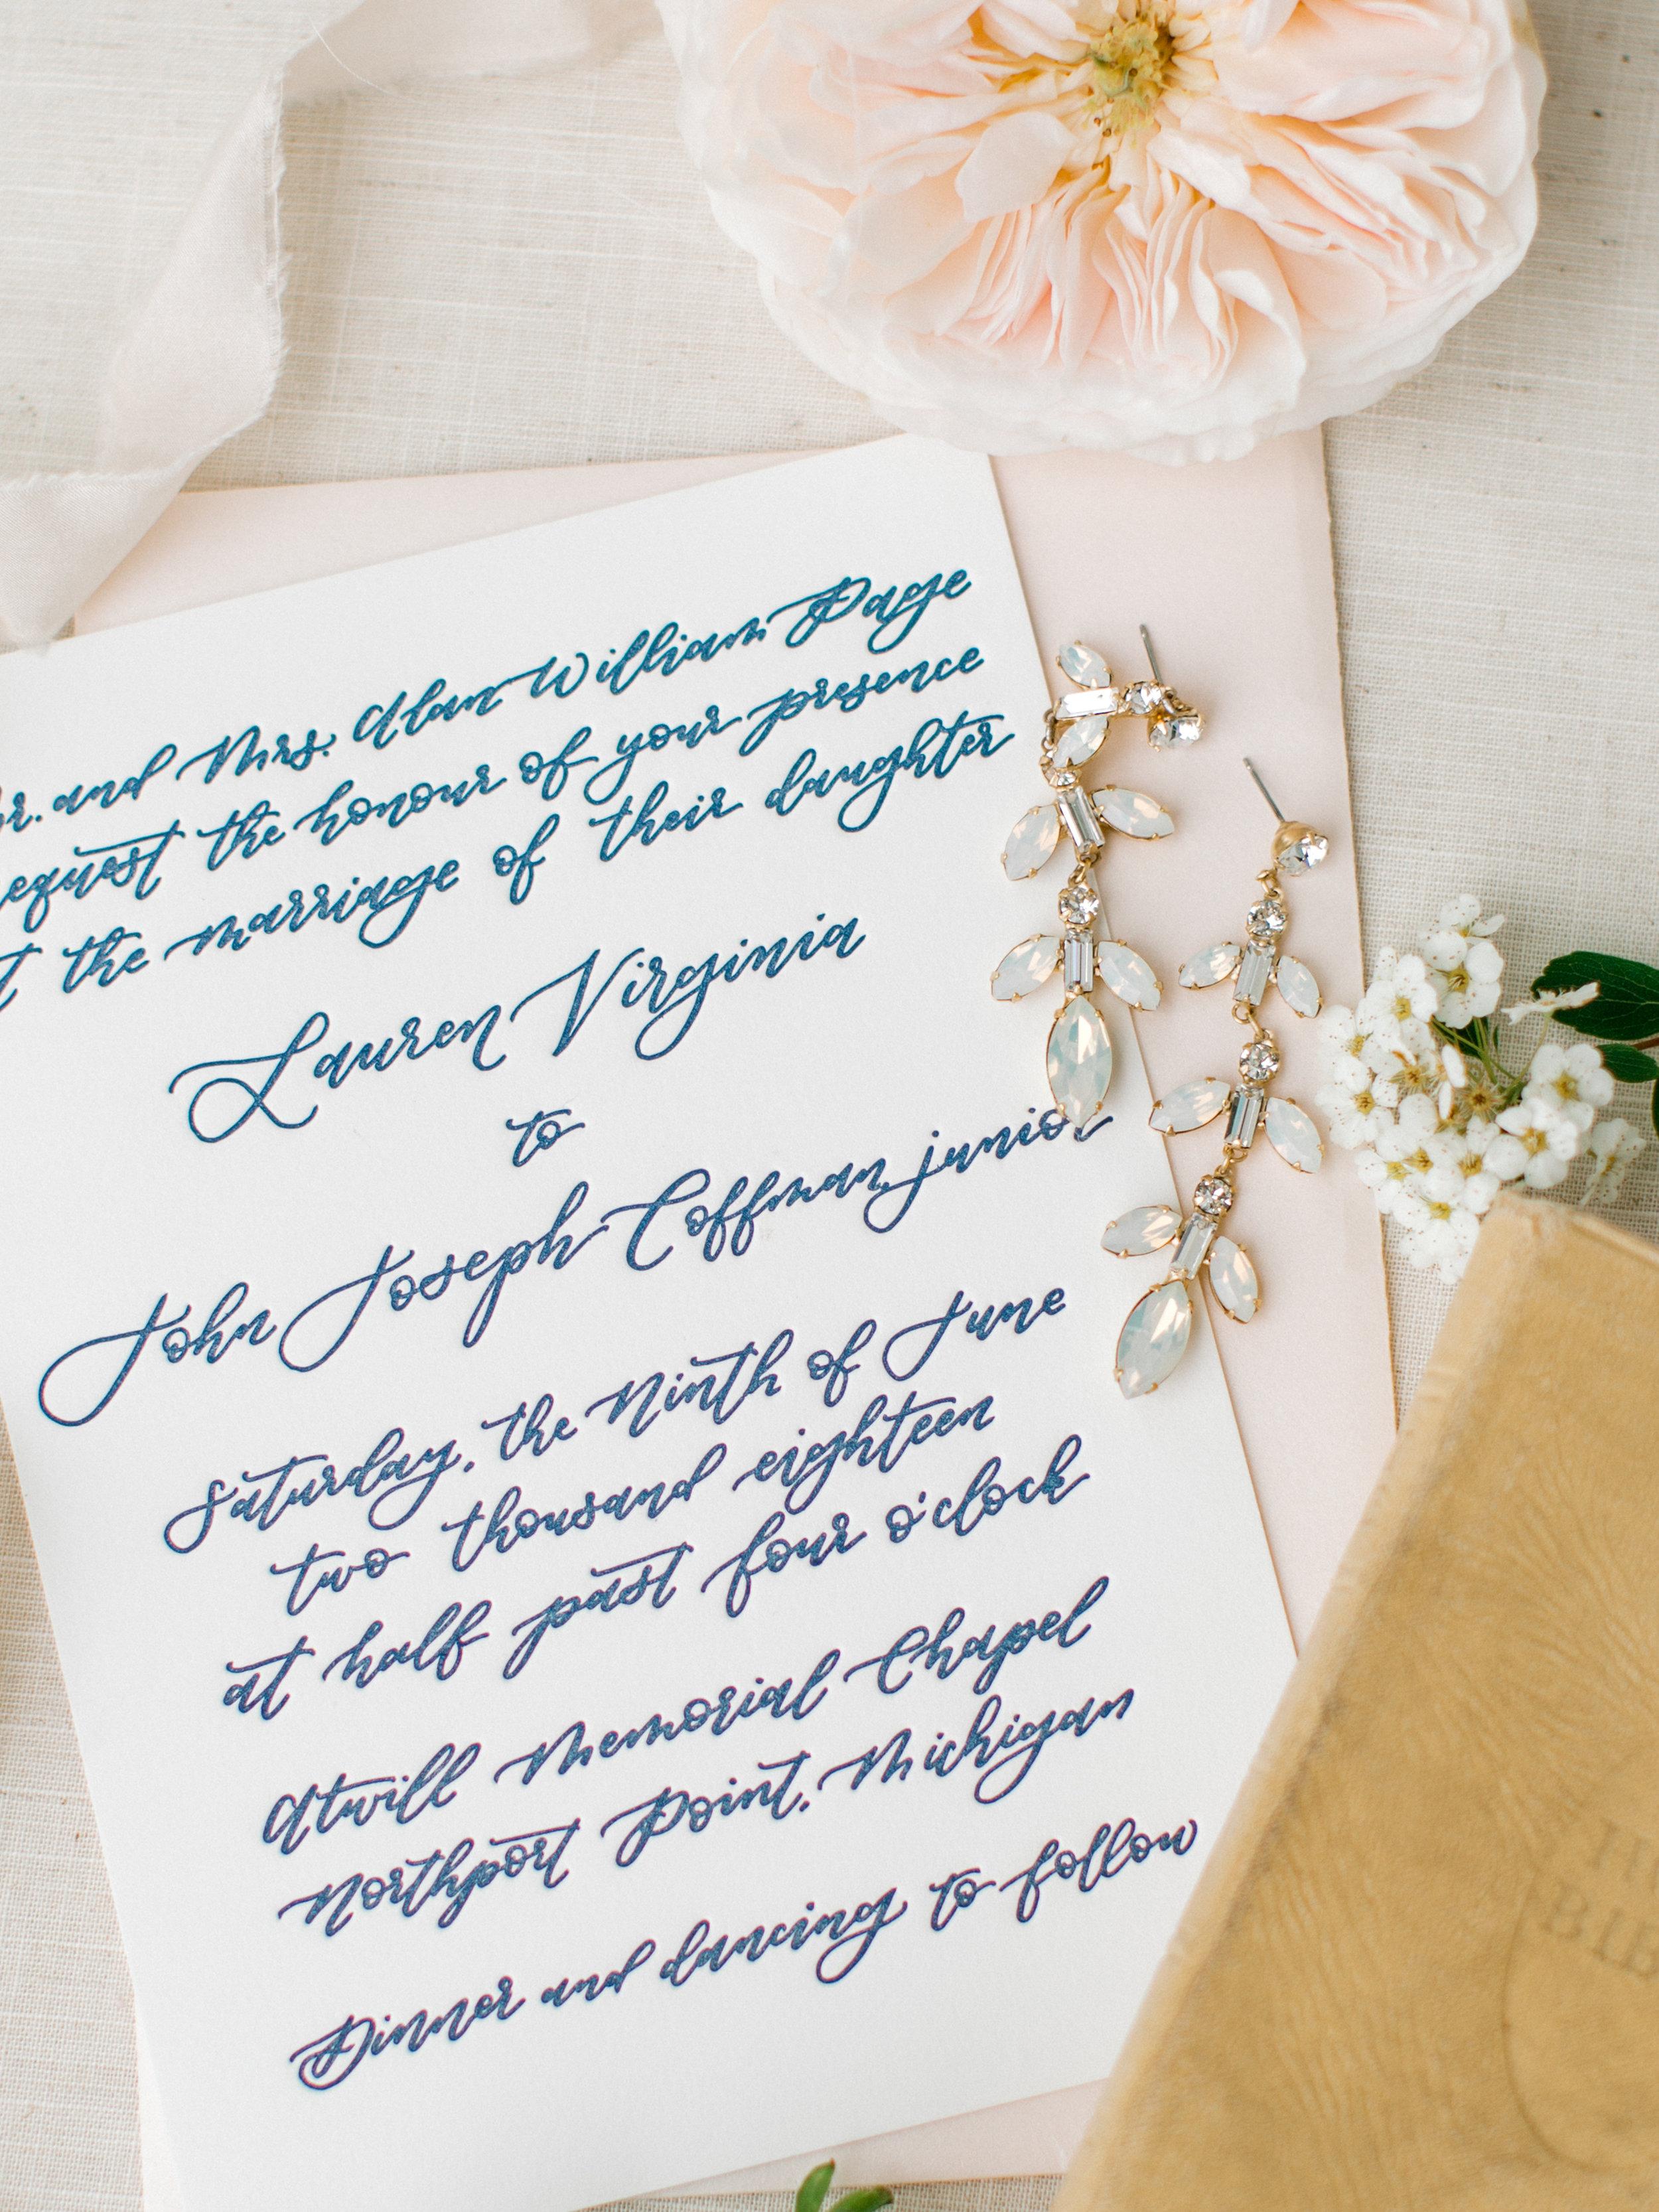 Coffman+Wedding+Details-6.jpg